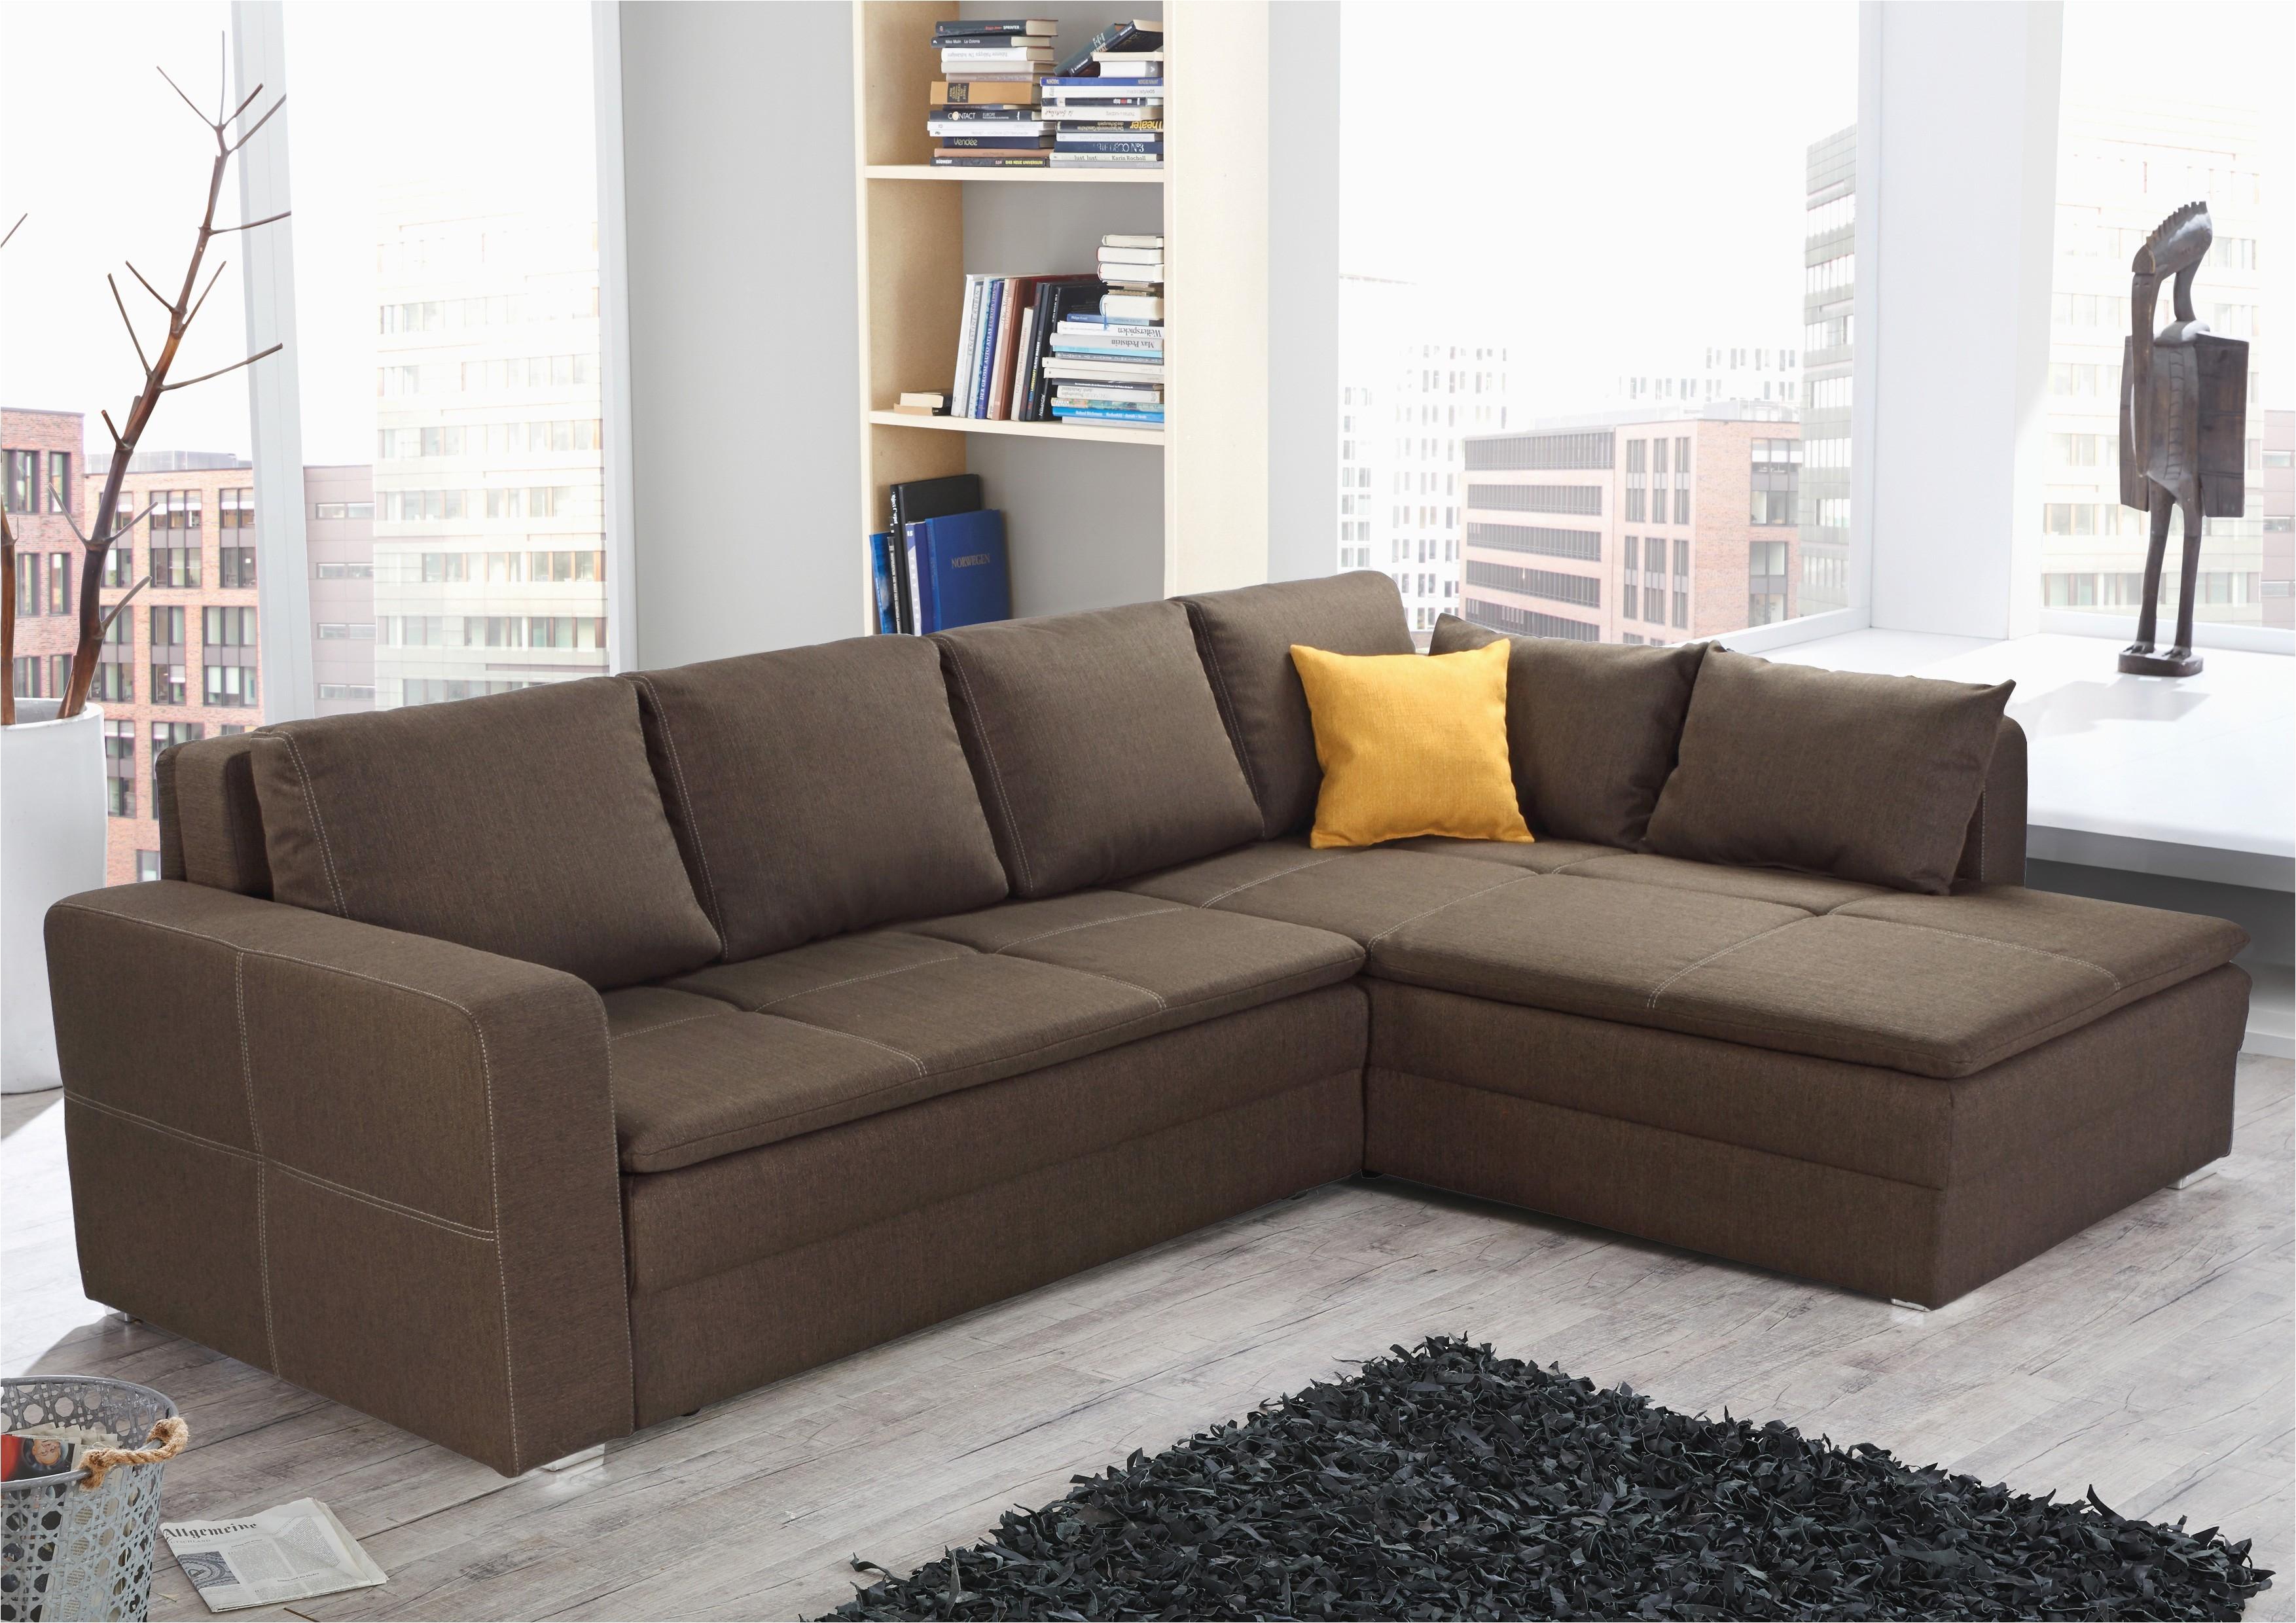 Macy Furniture Outlet 33 Fresh Of Macys Furniture Sleeper sofa Gallery Home Furniture Ideas